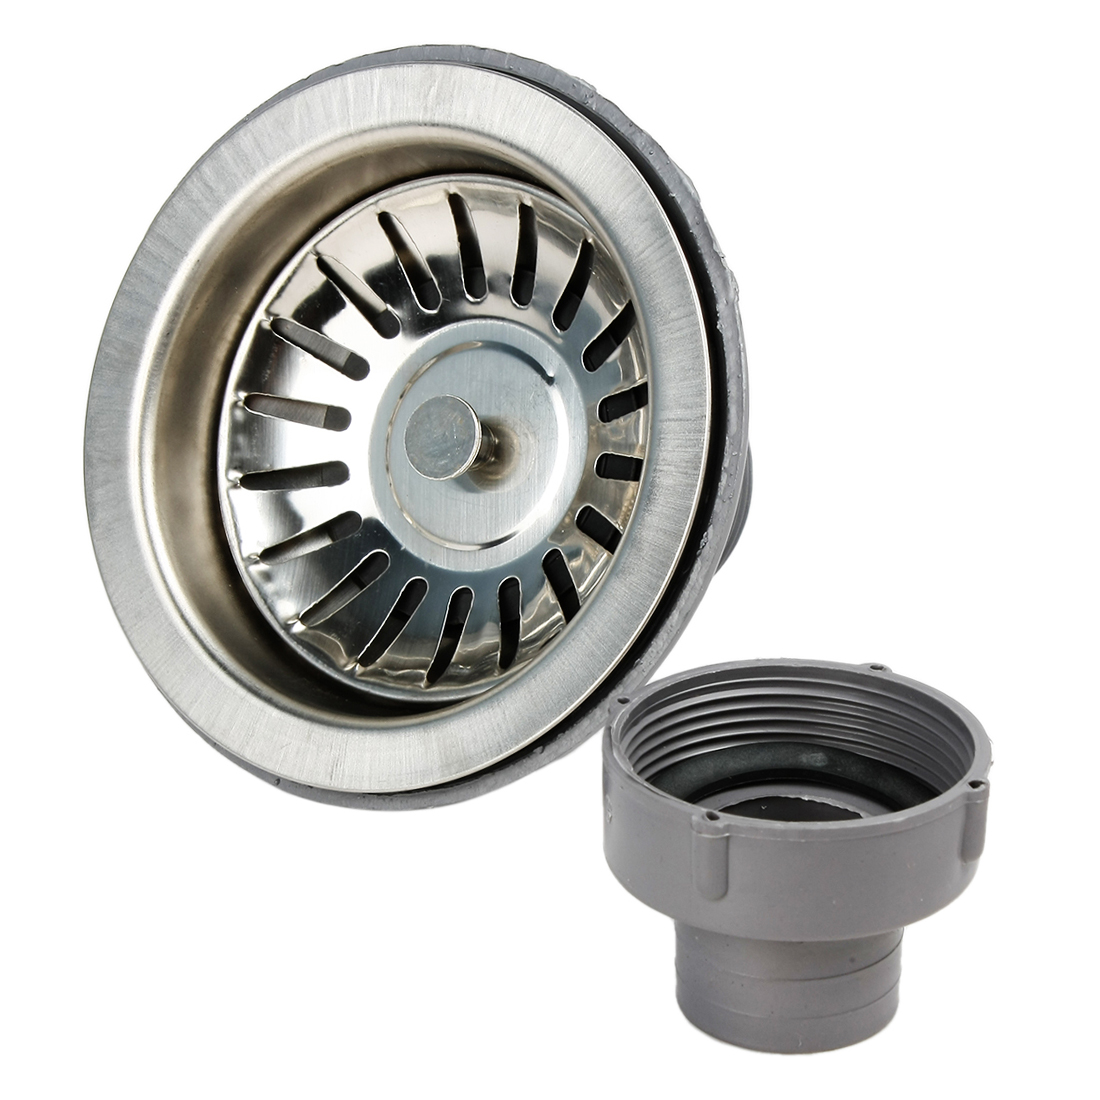 Kitchen Sink Strainer Basket Drain Garbage Stopper Gray Silver Tone w Fixed Post Basket